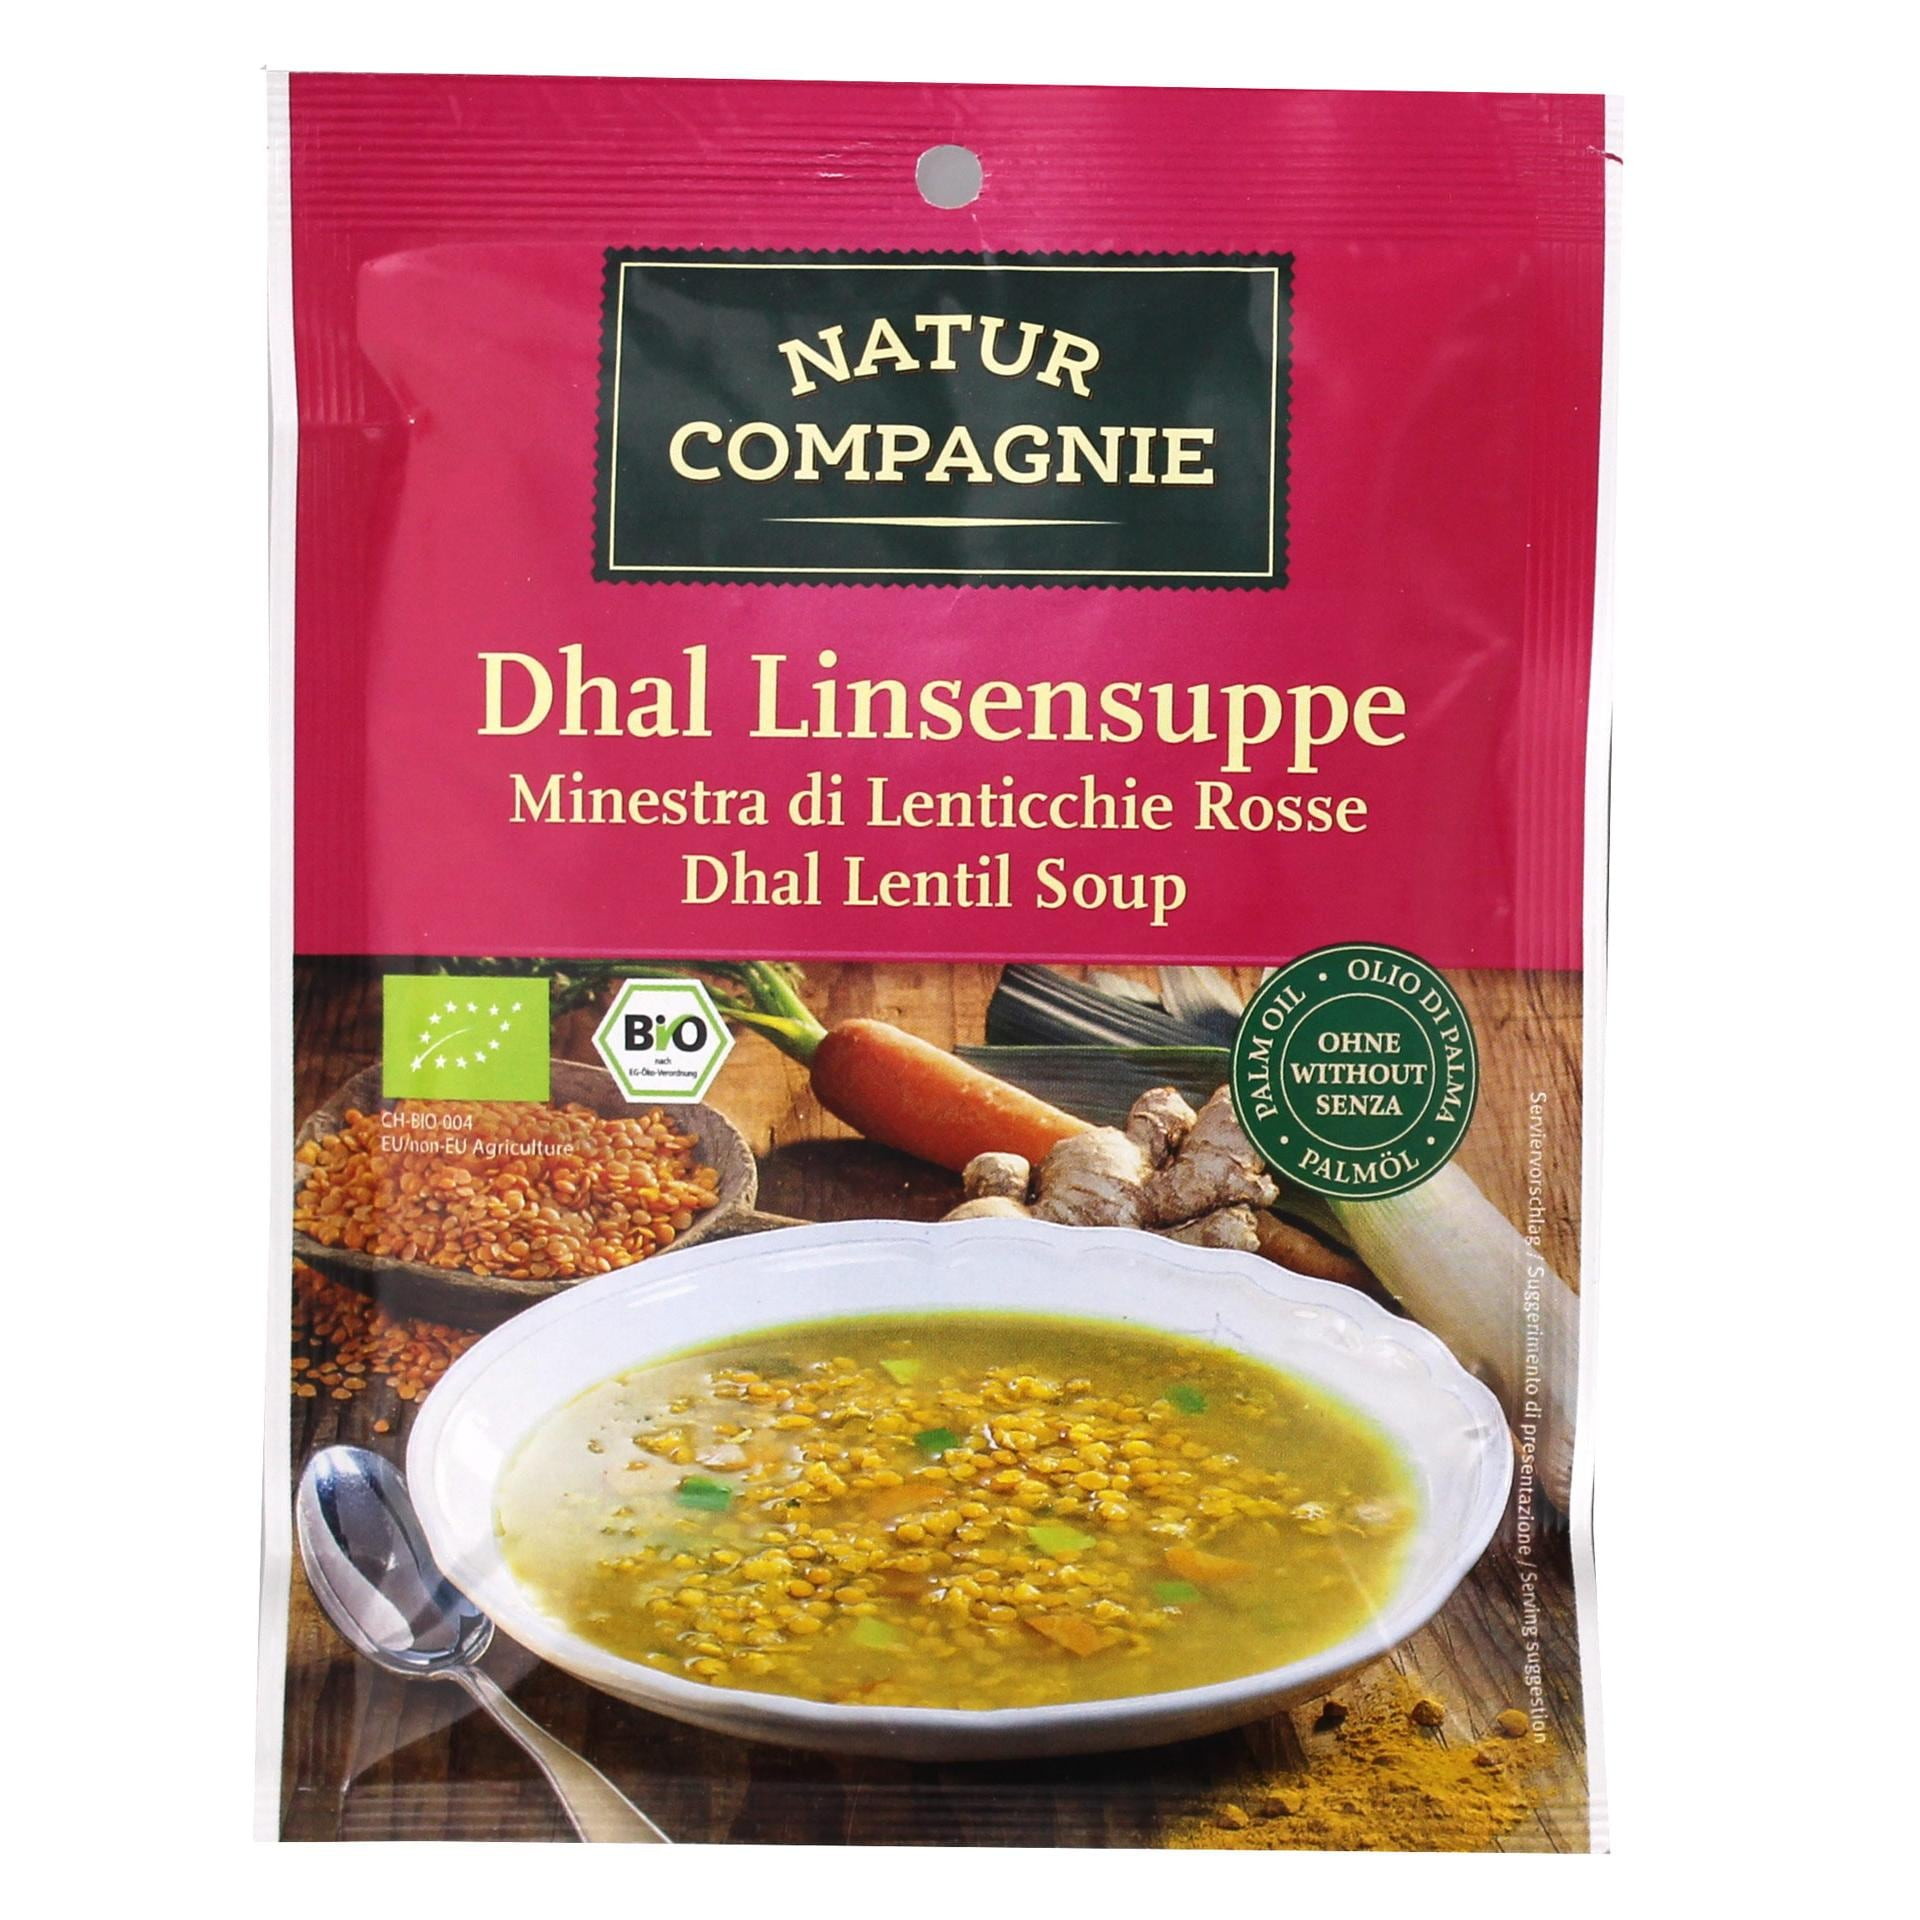 Natur Compagnie Bio Dhal Linsensuppe 60g